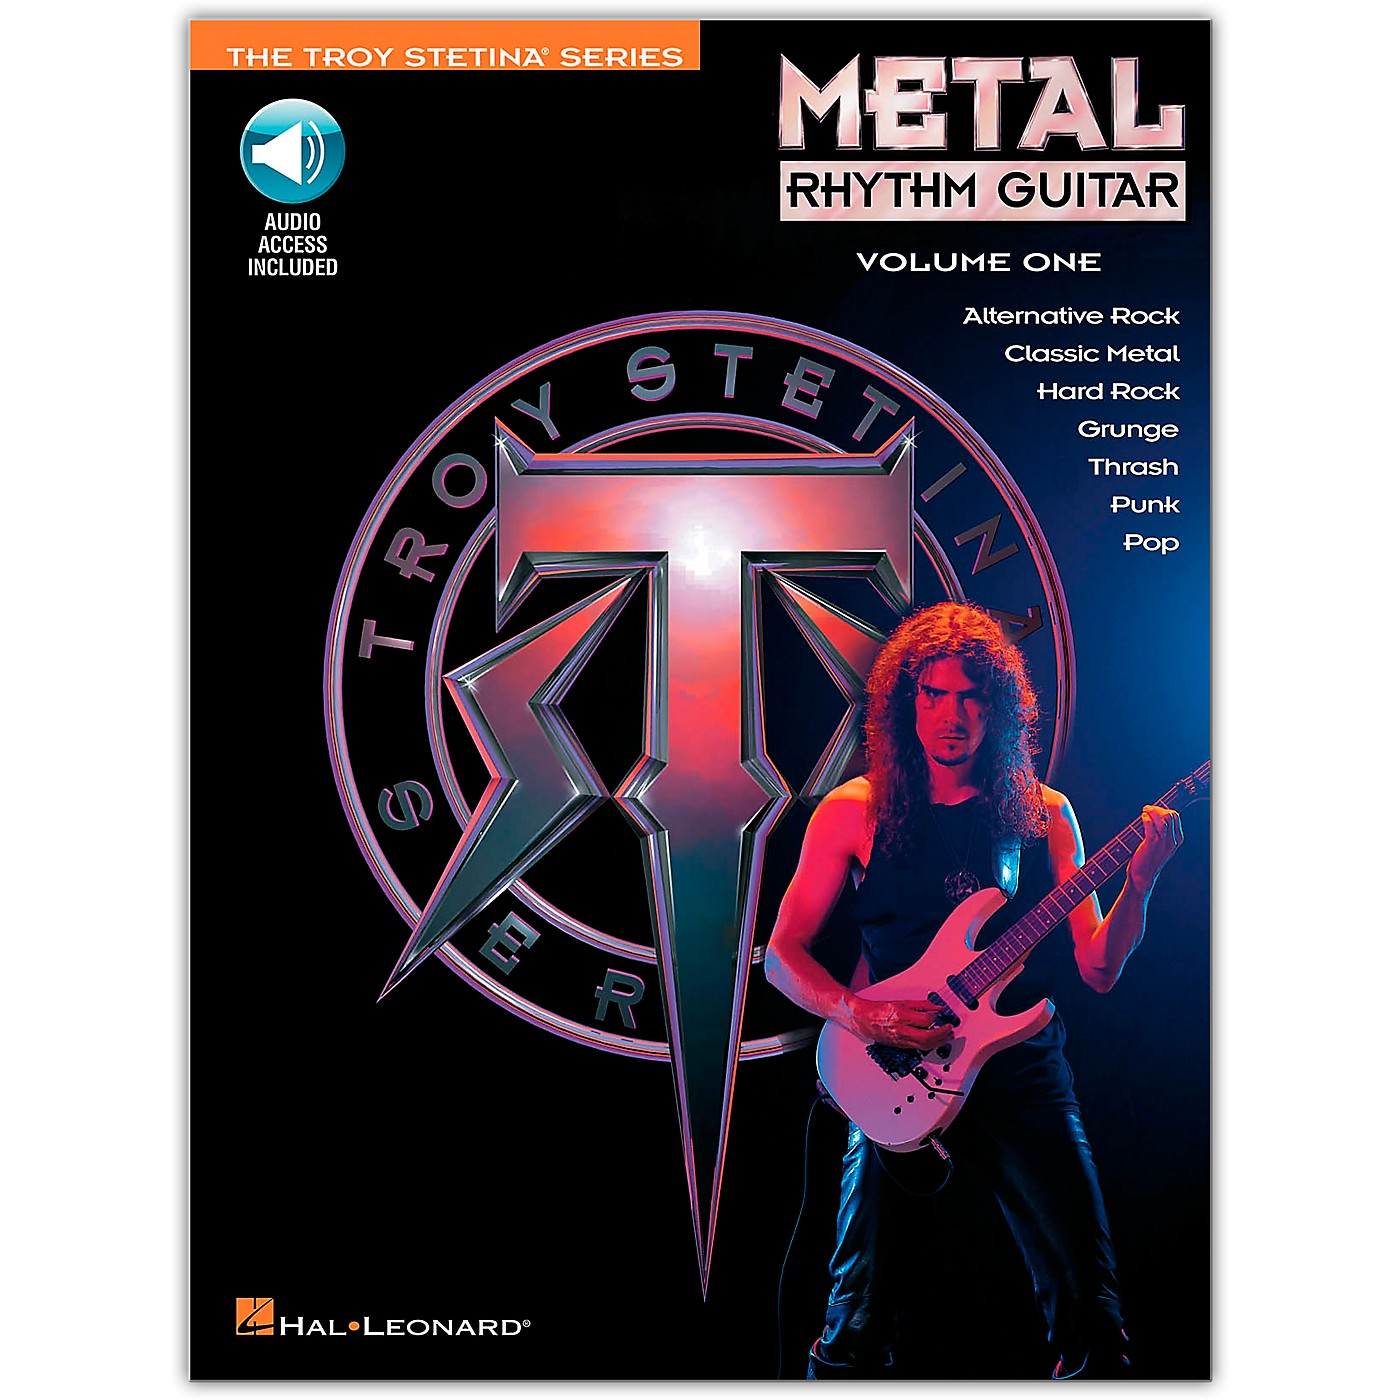 Hal Leonard Metal Rhythm Guitar Volume 1 (Book/Online Audio) thumbnail